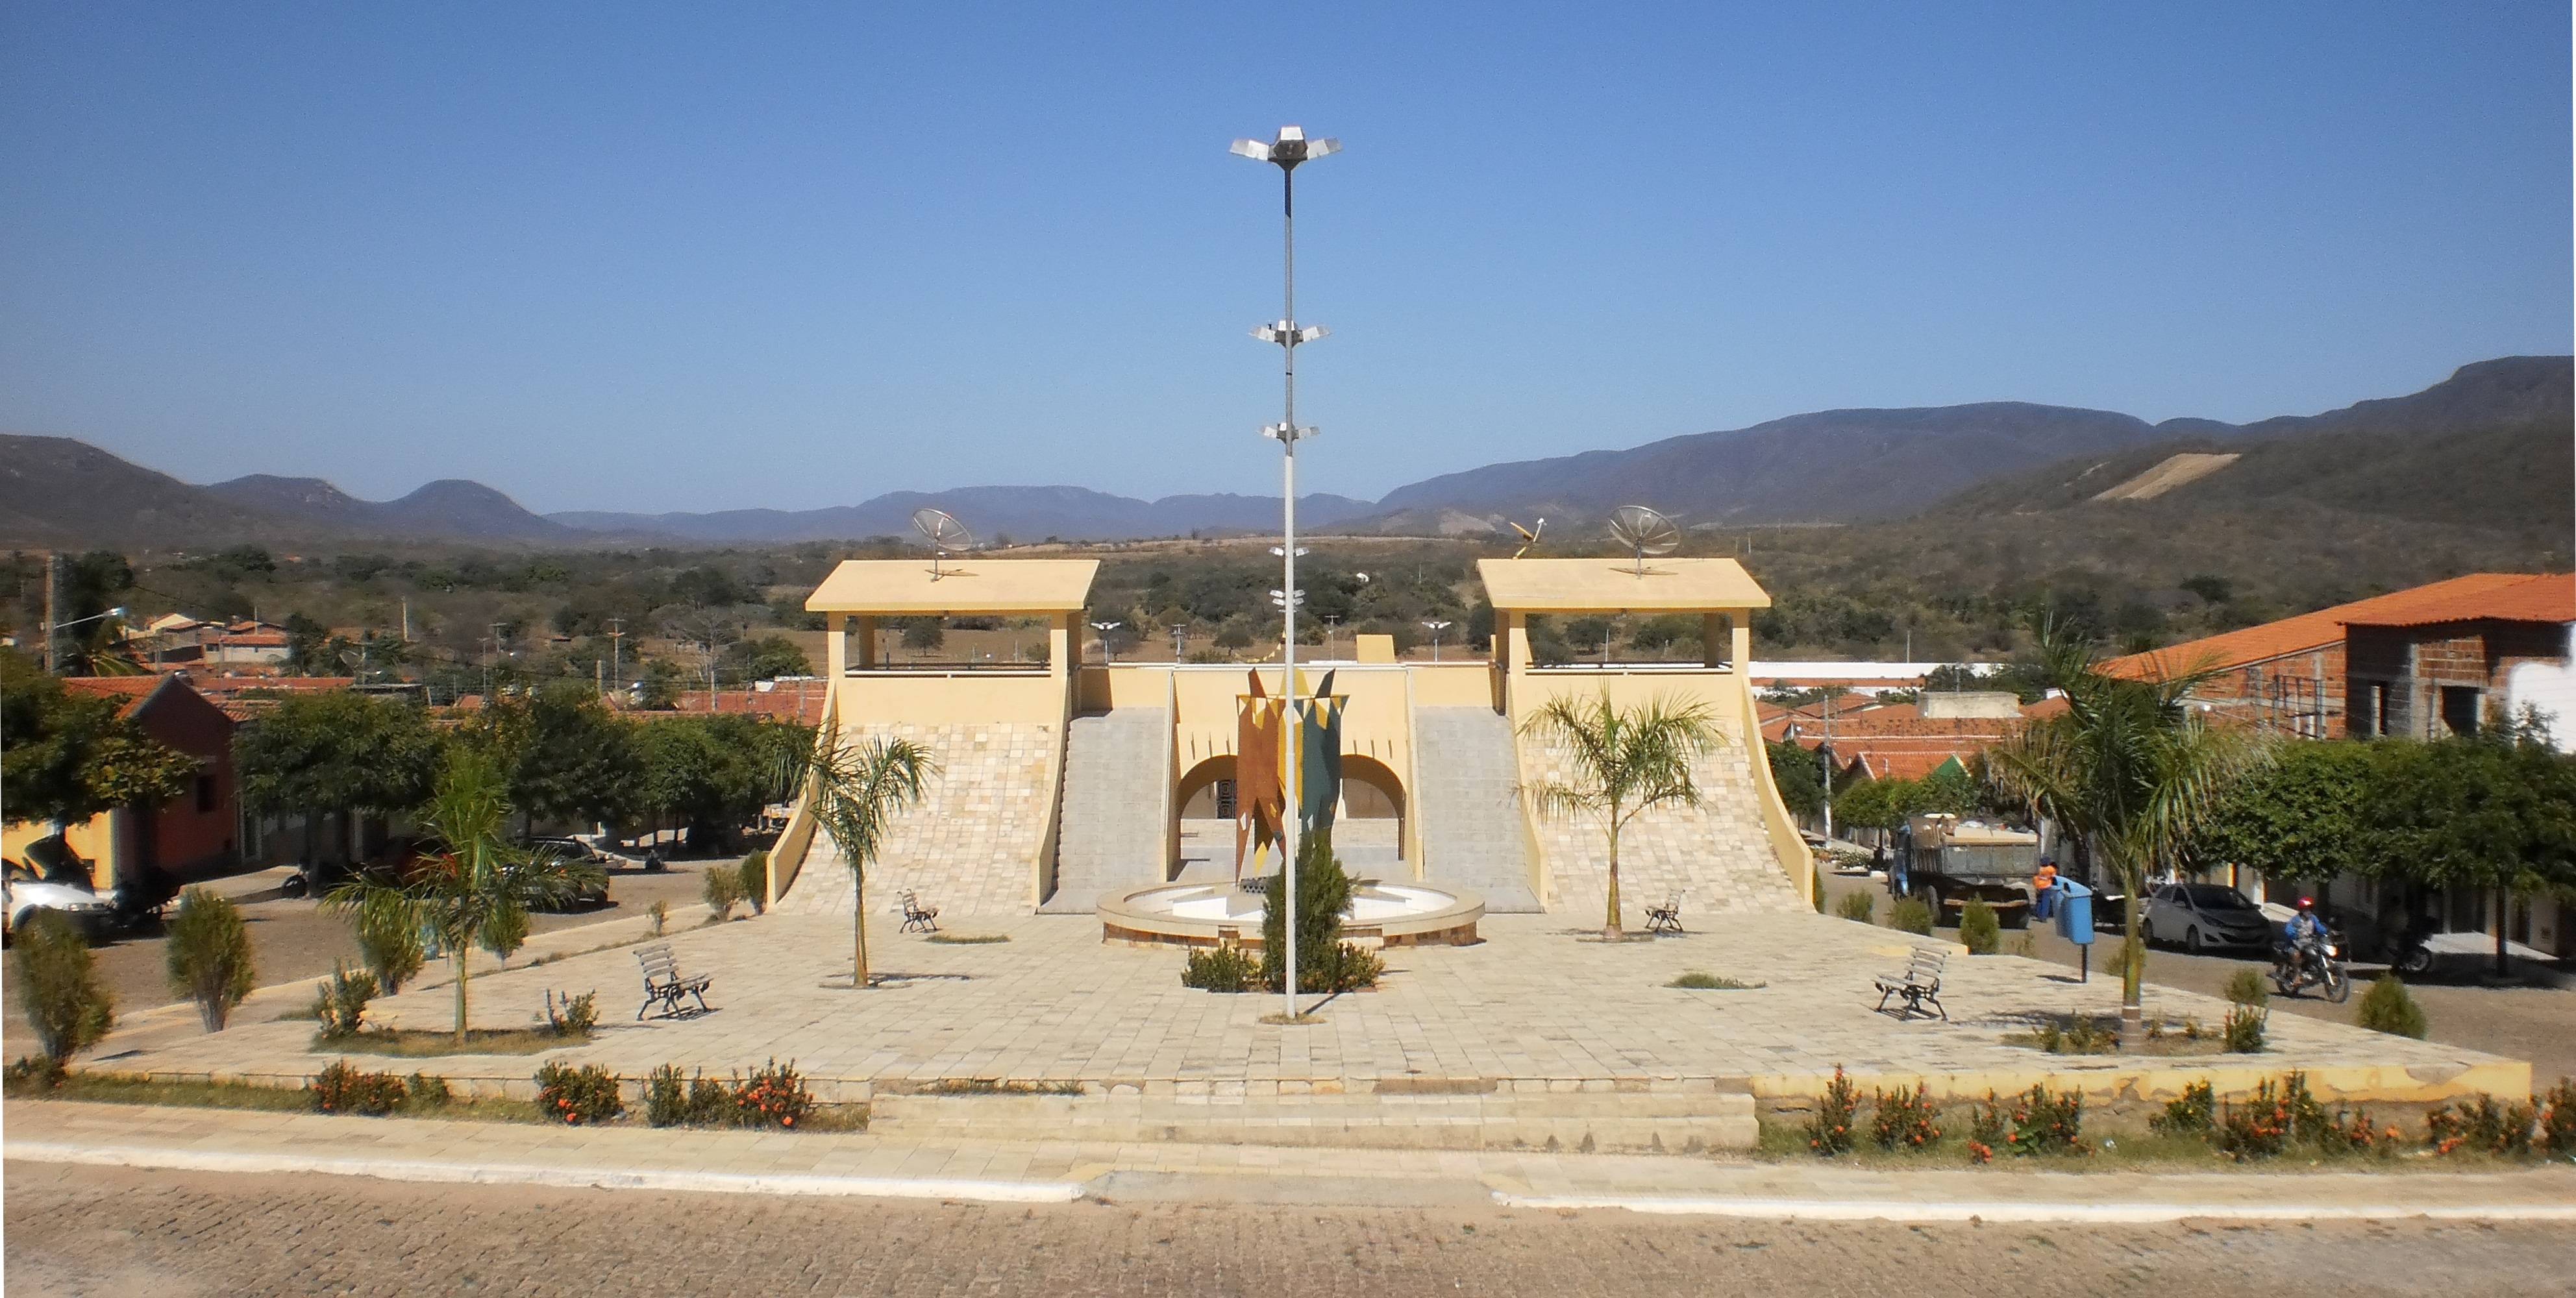 Riacho de Santana Bahia fonte: upload.wikimedia.org